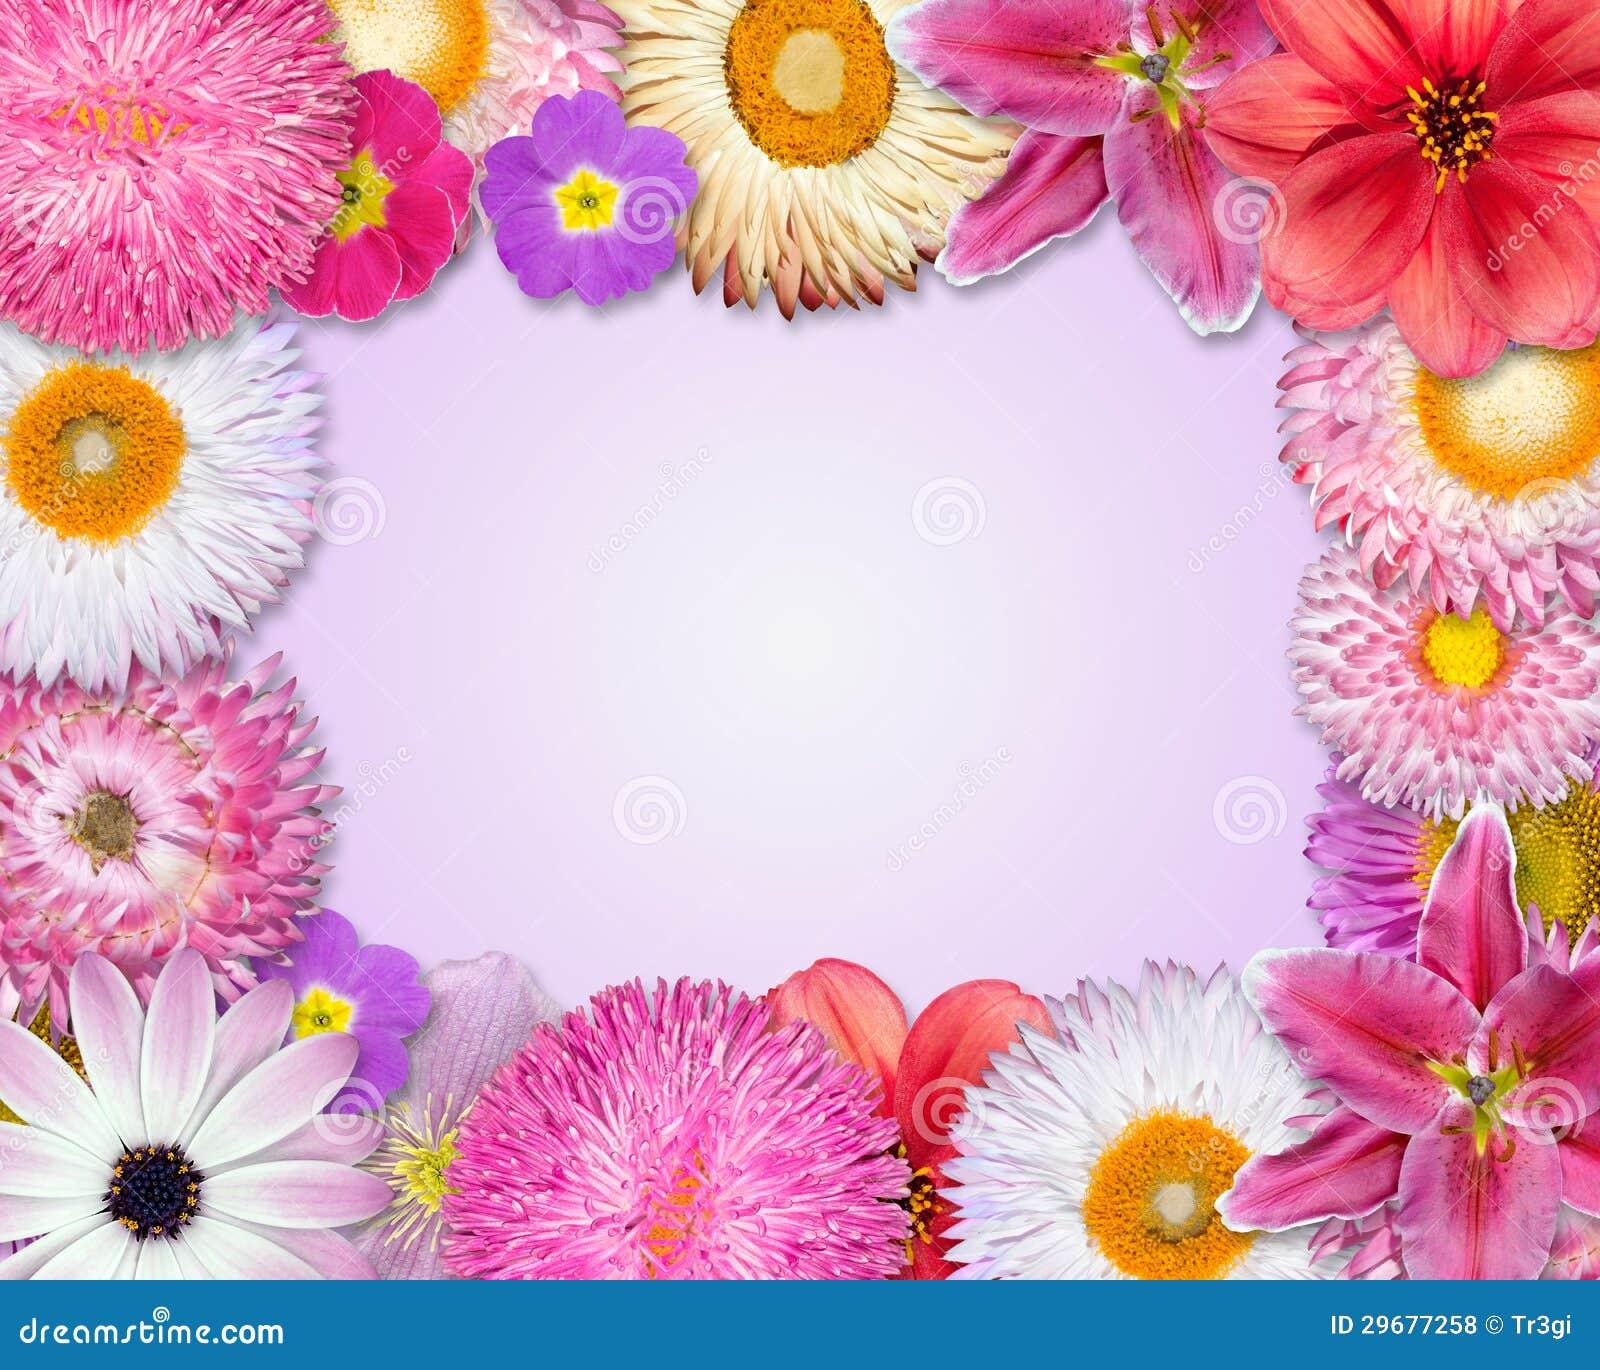 blumen rahmen rosa purpur rote blumen stockfoto bild. Black Bedroom Furniture Sets. Home Design Ideas